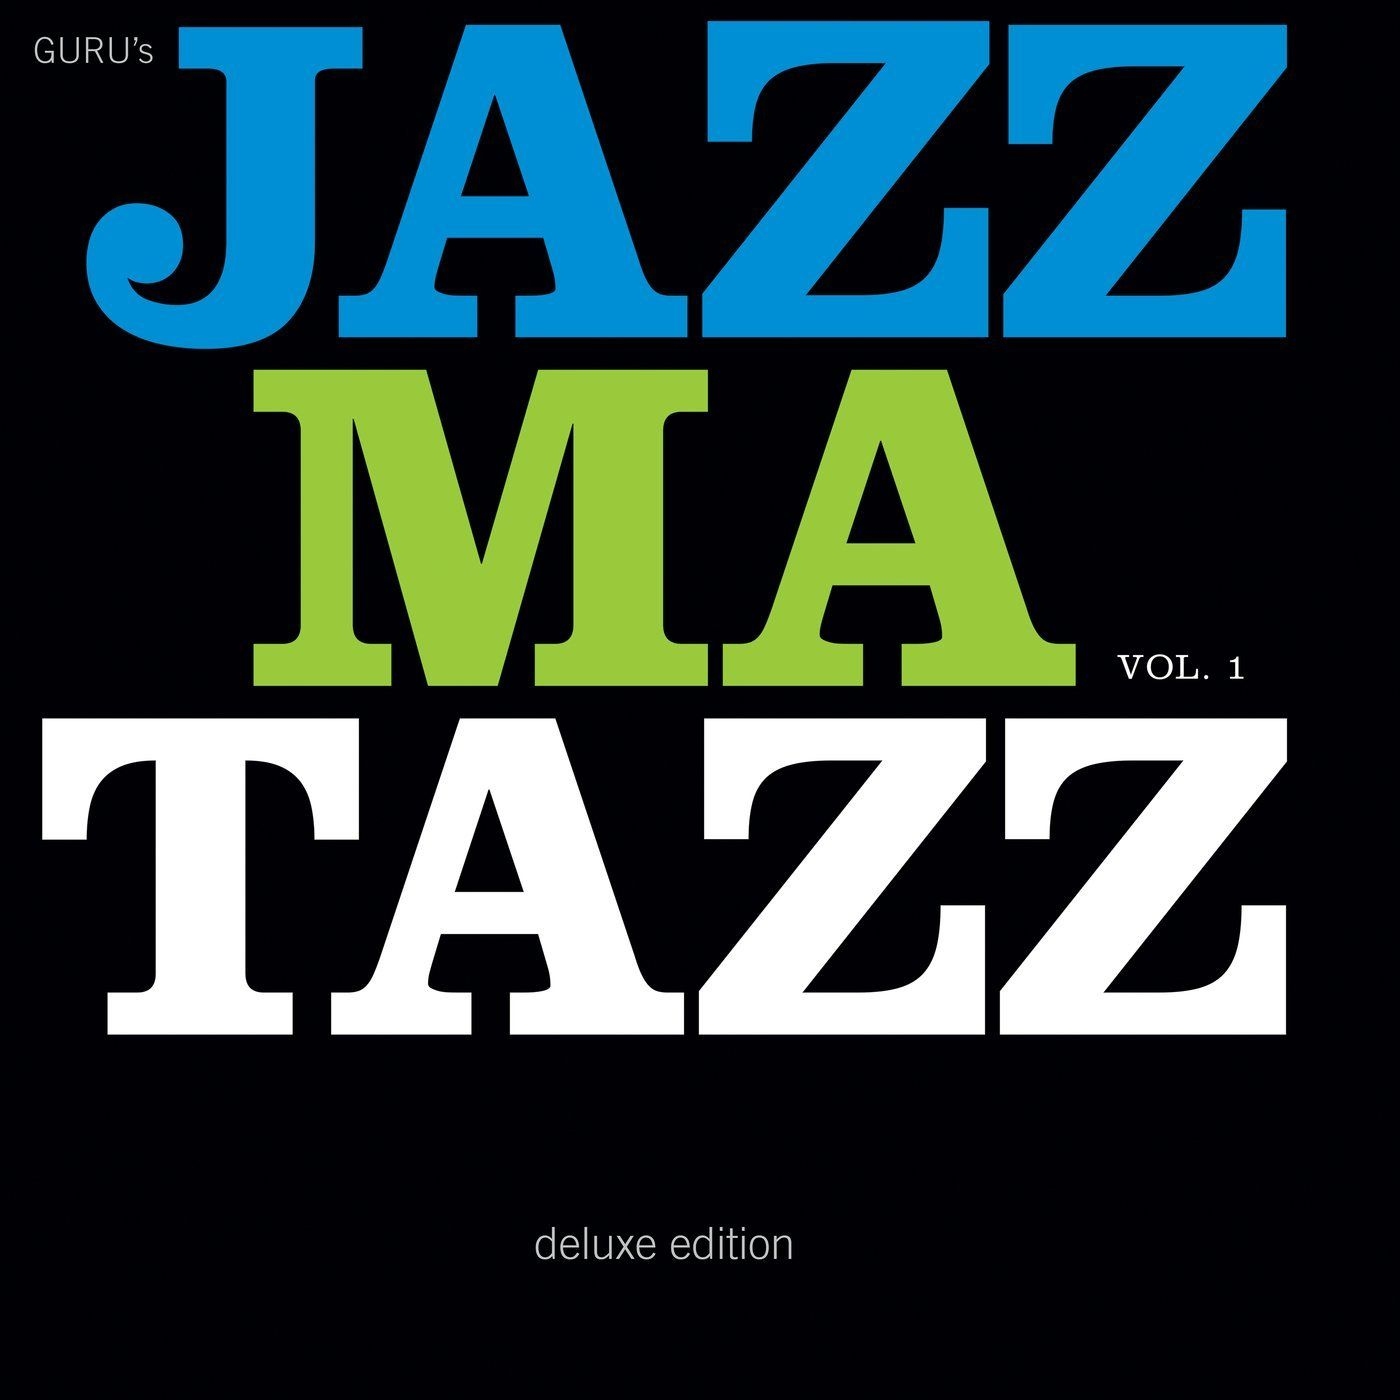 Guru S Jazzmatazz Vol 1 25th Anniv Deluxe Edt Vinyl